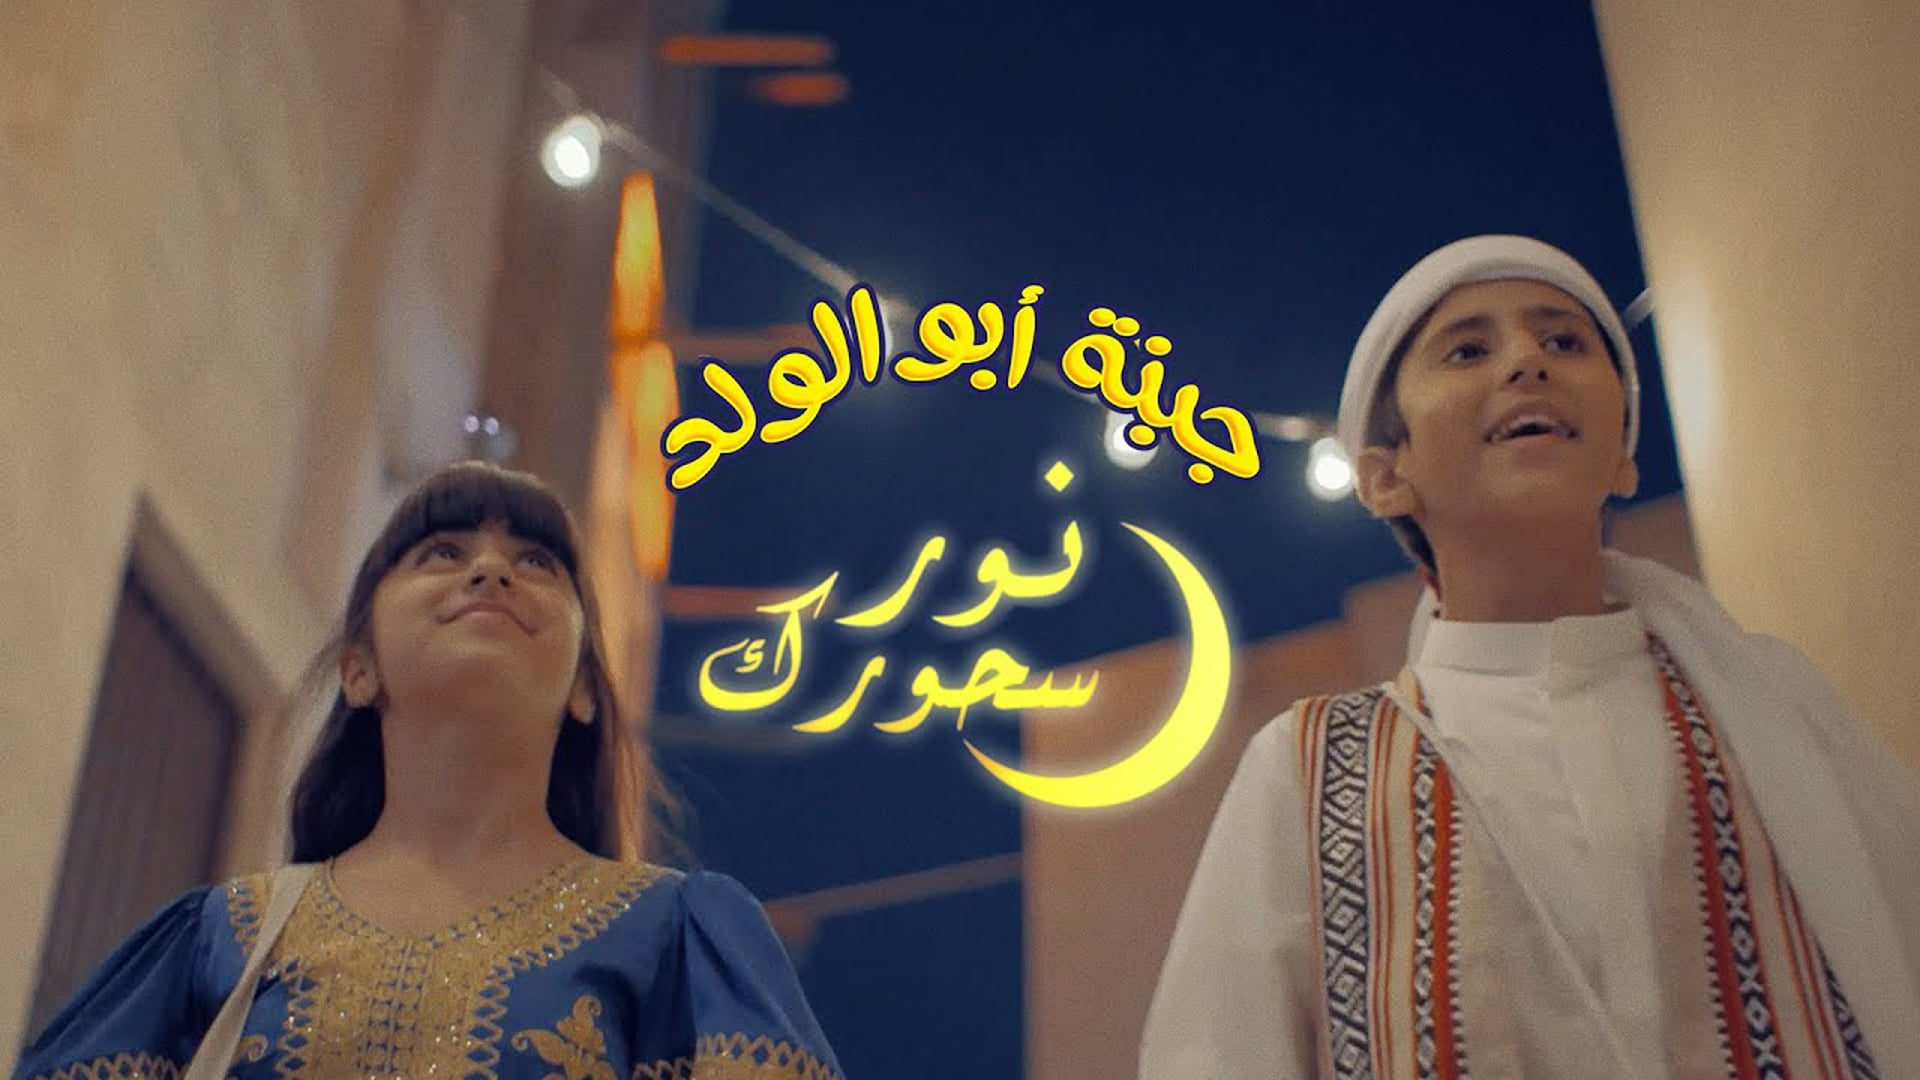 Jibnet Abu Al-Walad Cheese | Light Suhurk